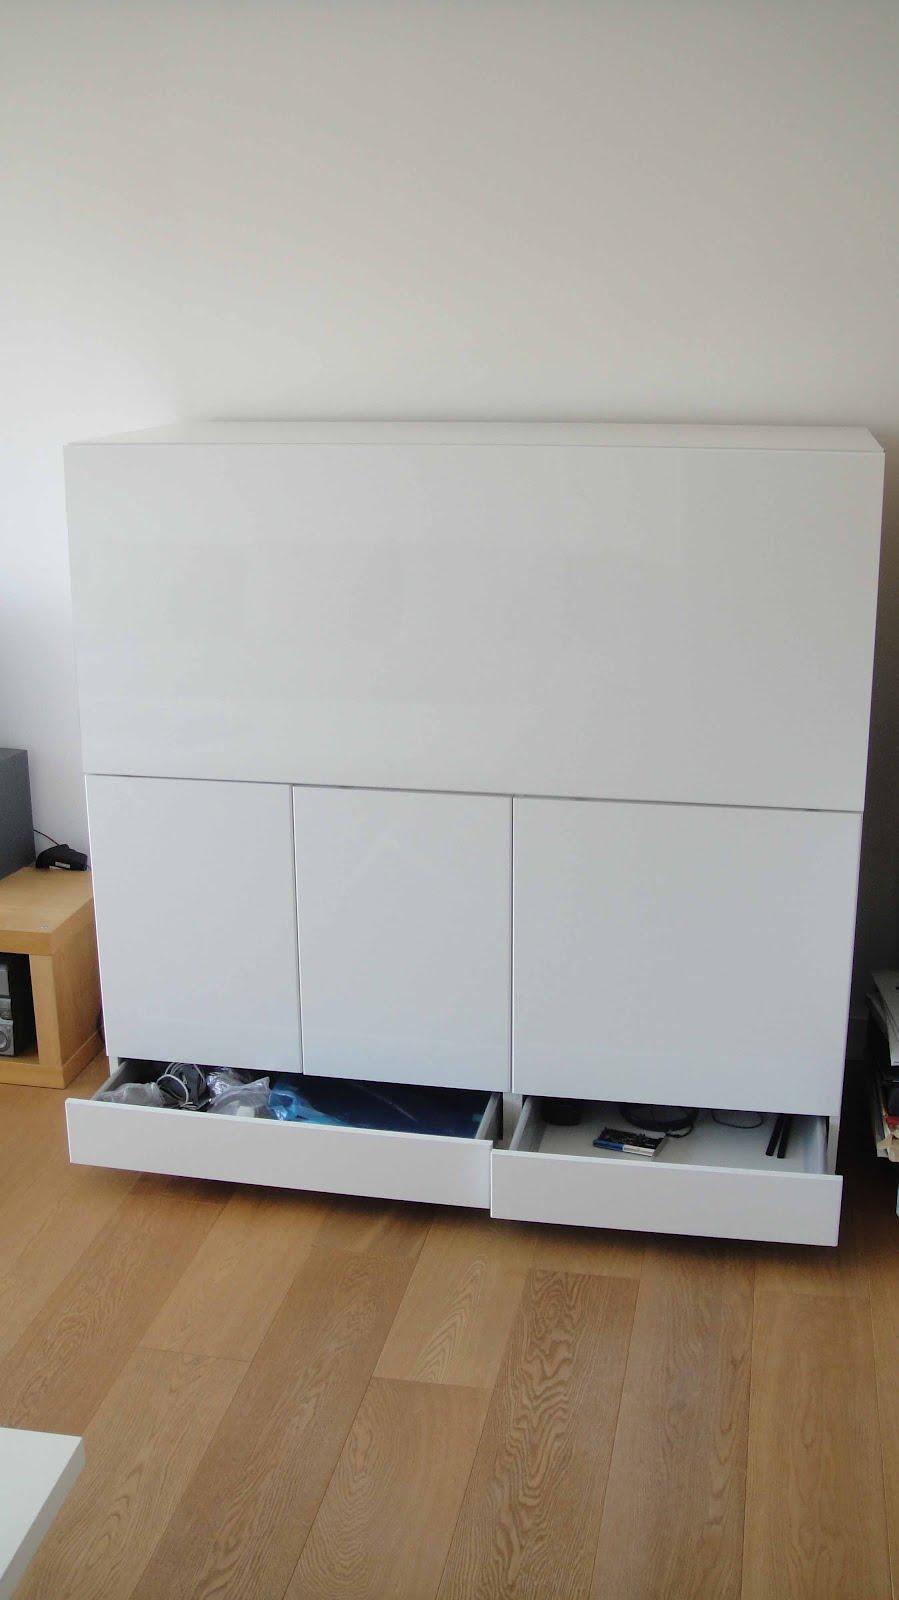 Ikea Hack MuebleEscritorio Besta  x4duroscom